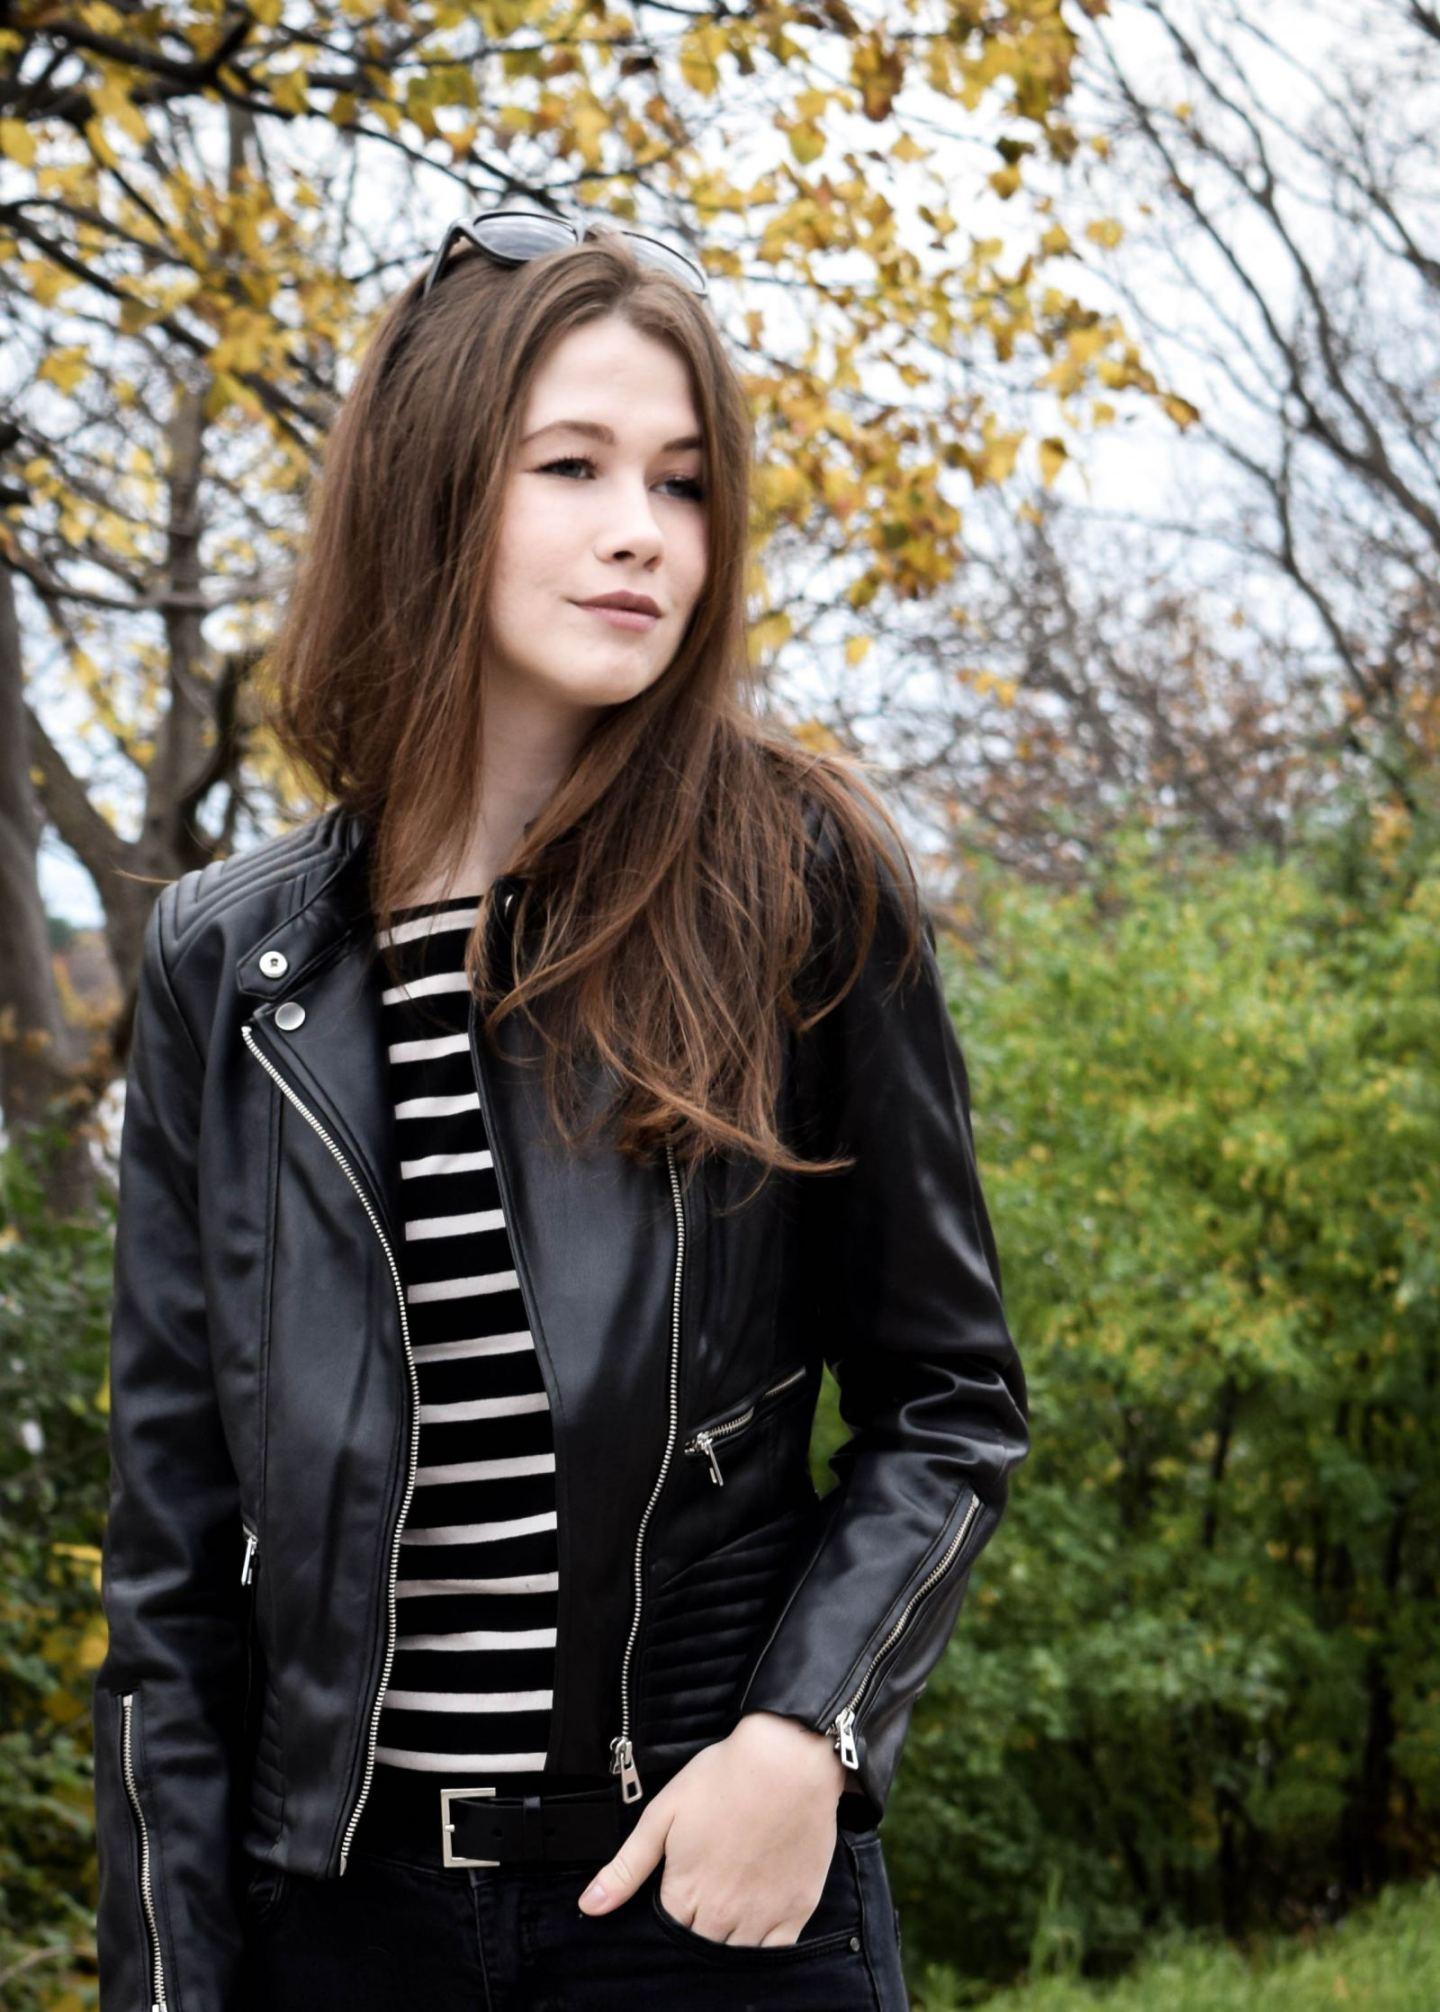 Leather Jacket 4 | Monochrome Minimalist